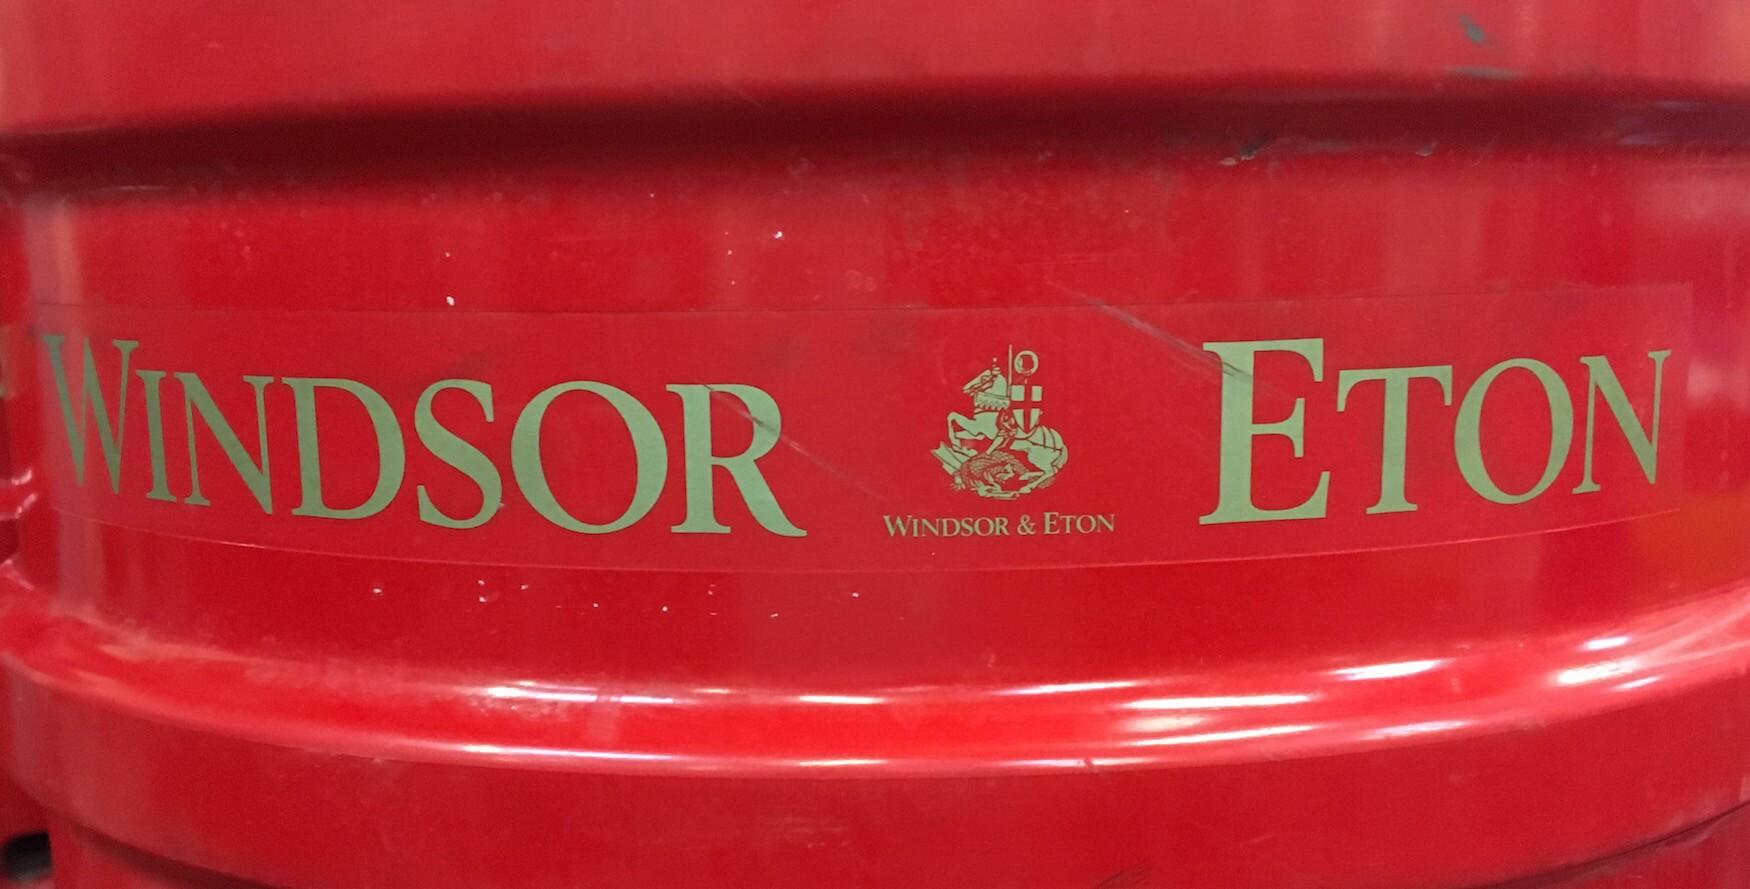 Windsor & Eton Keg